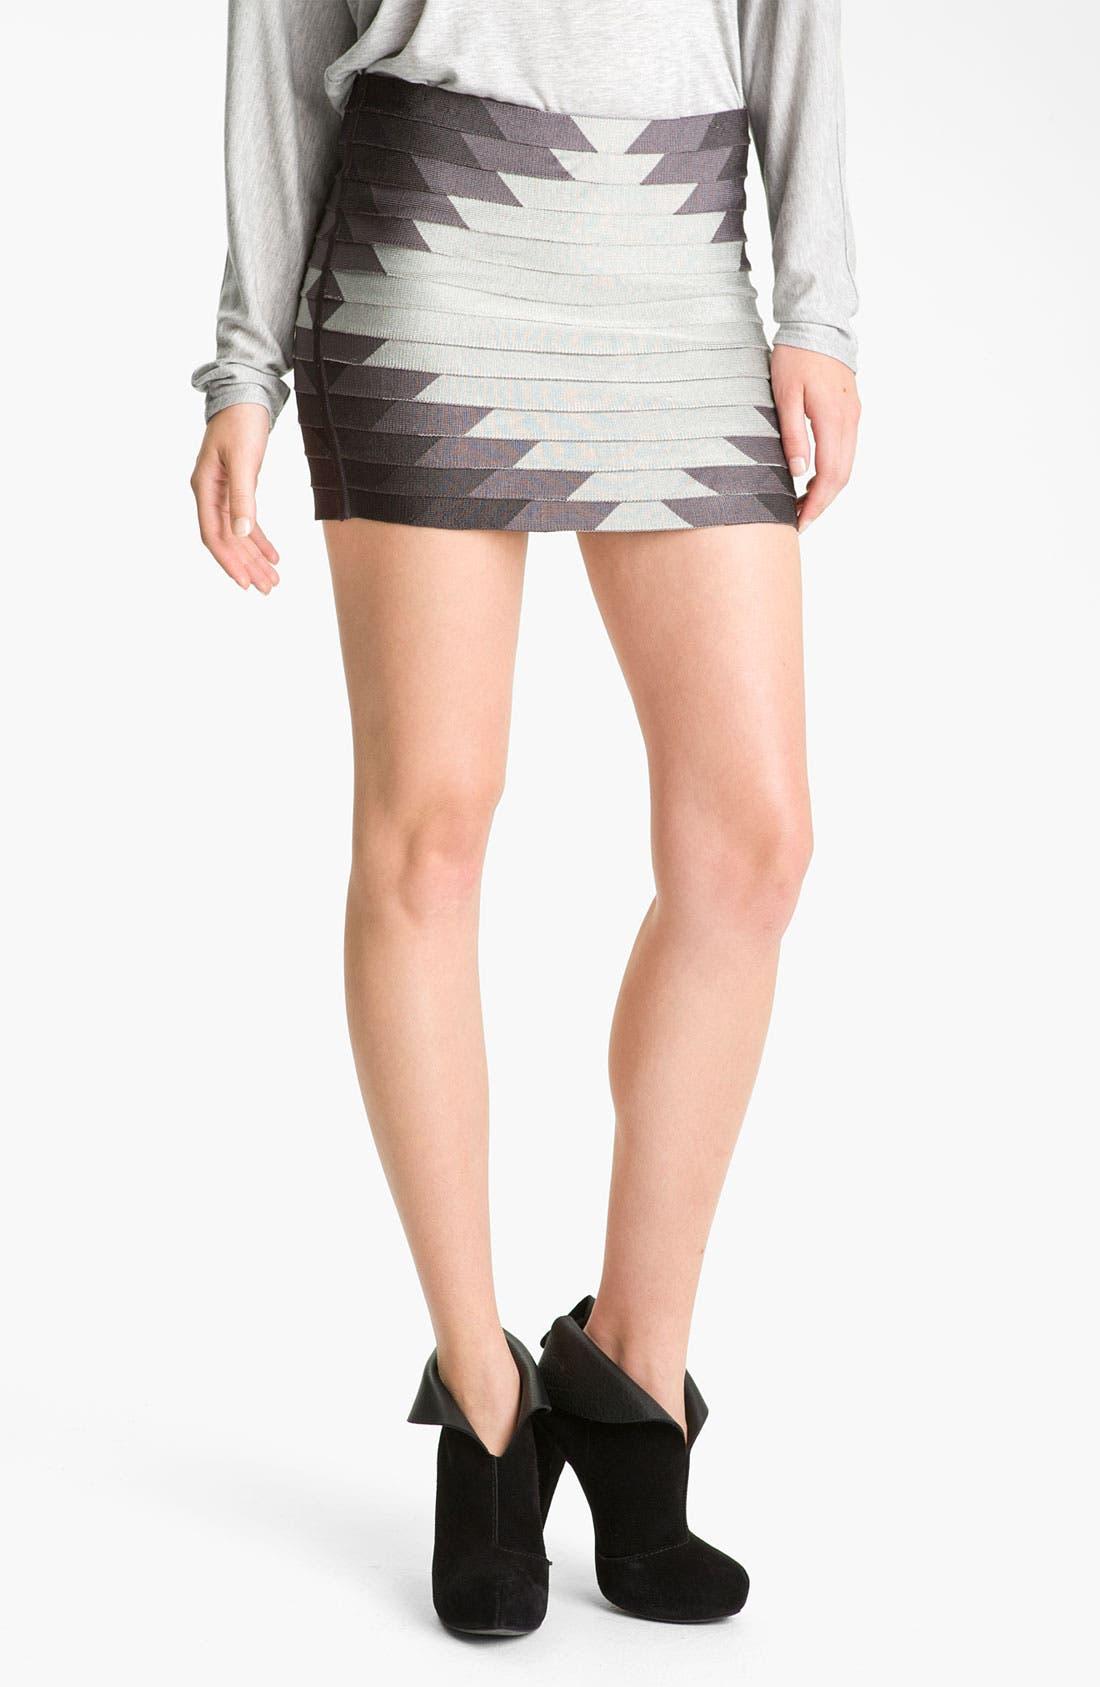 Main Image - Haute Hippie 'Aztec' Bandage Skirt